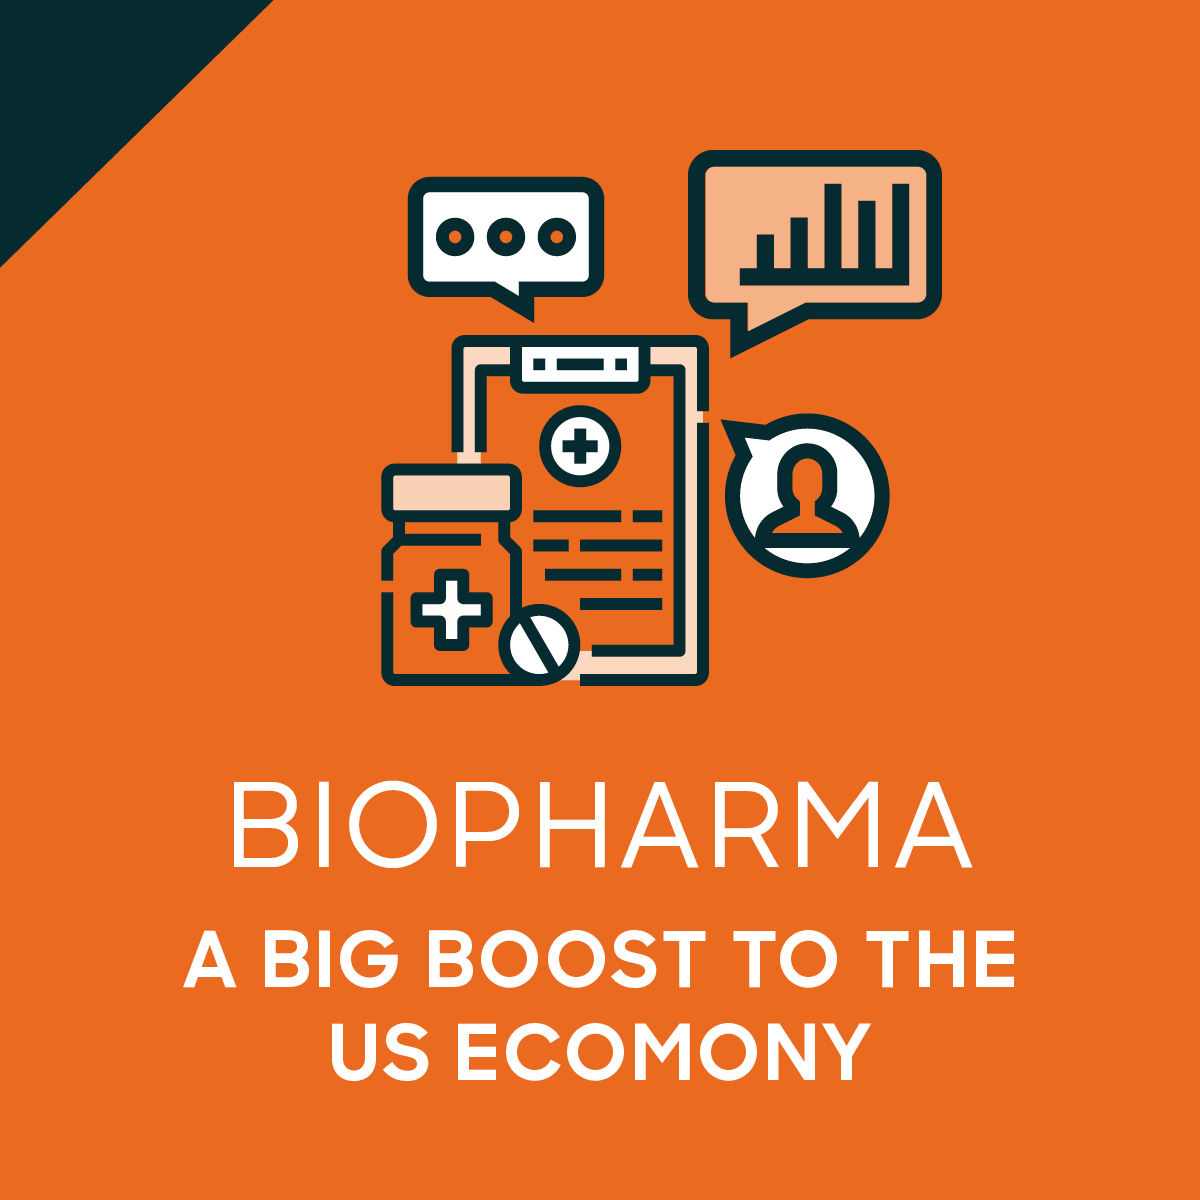 BioPharma Impact on US